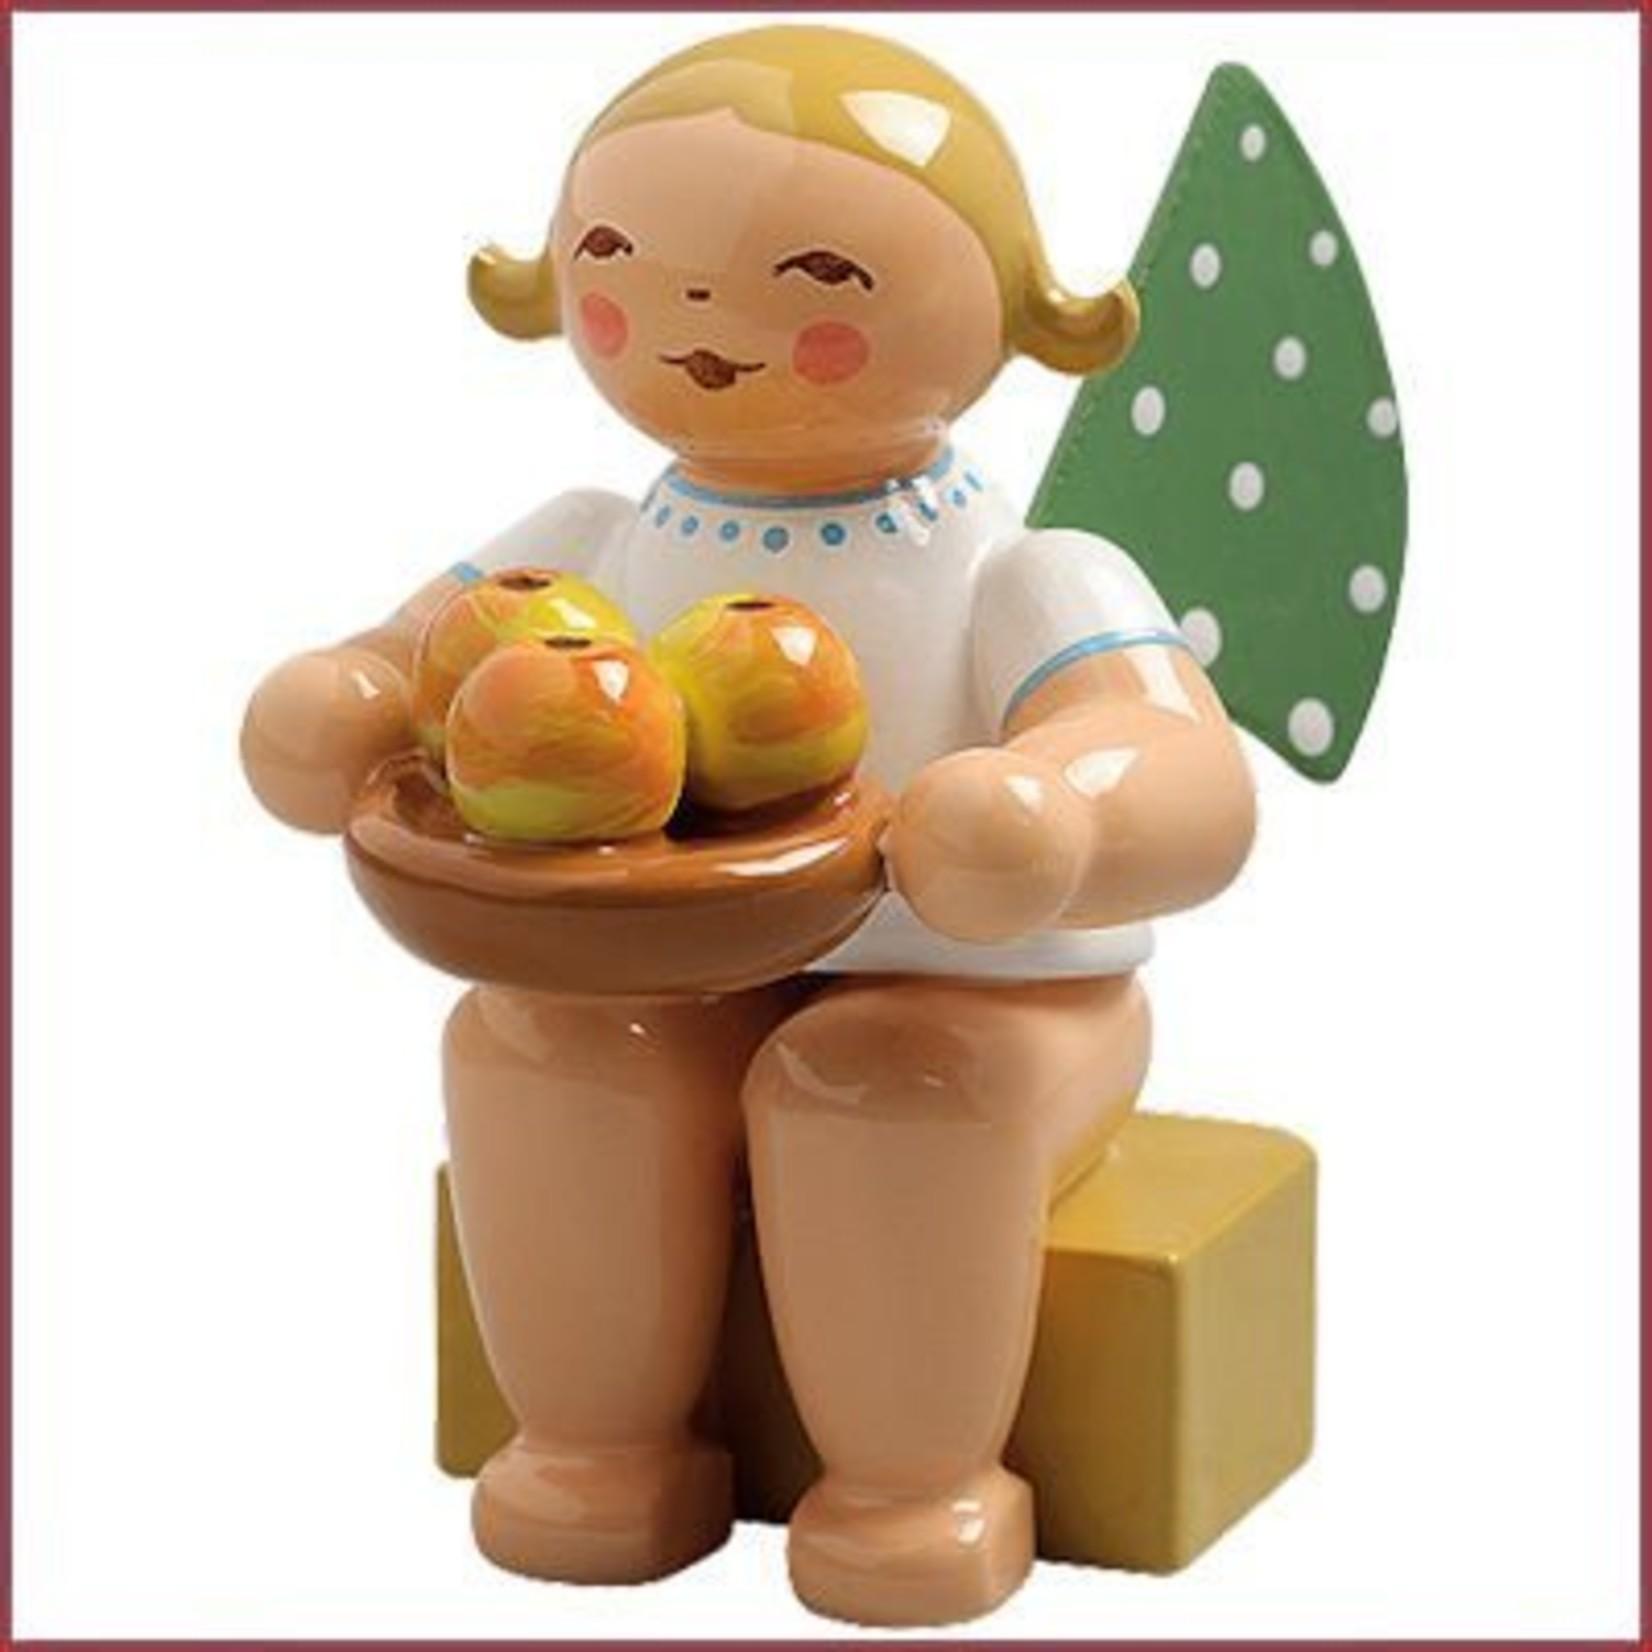 Wendt & Kühn Grunhainichense Engel met appelschaal - Kalenderfiguur 2016